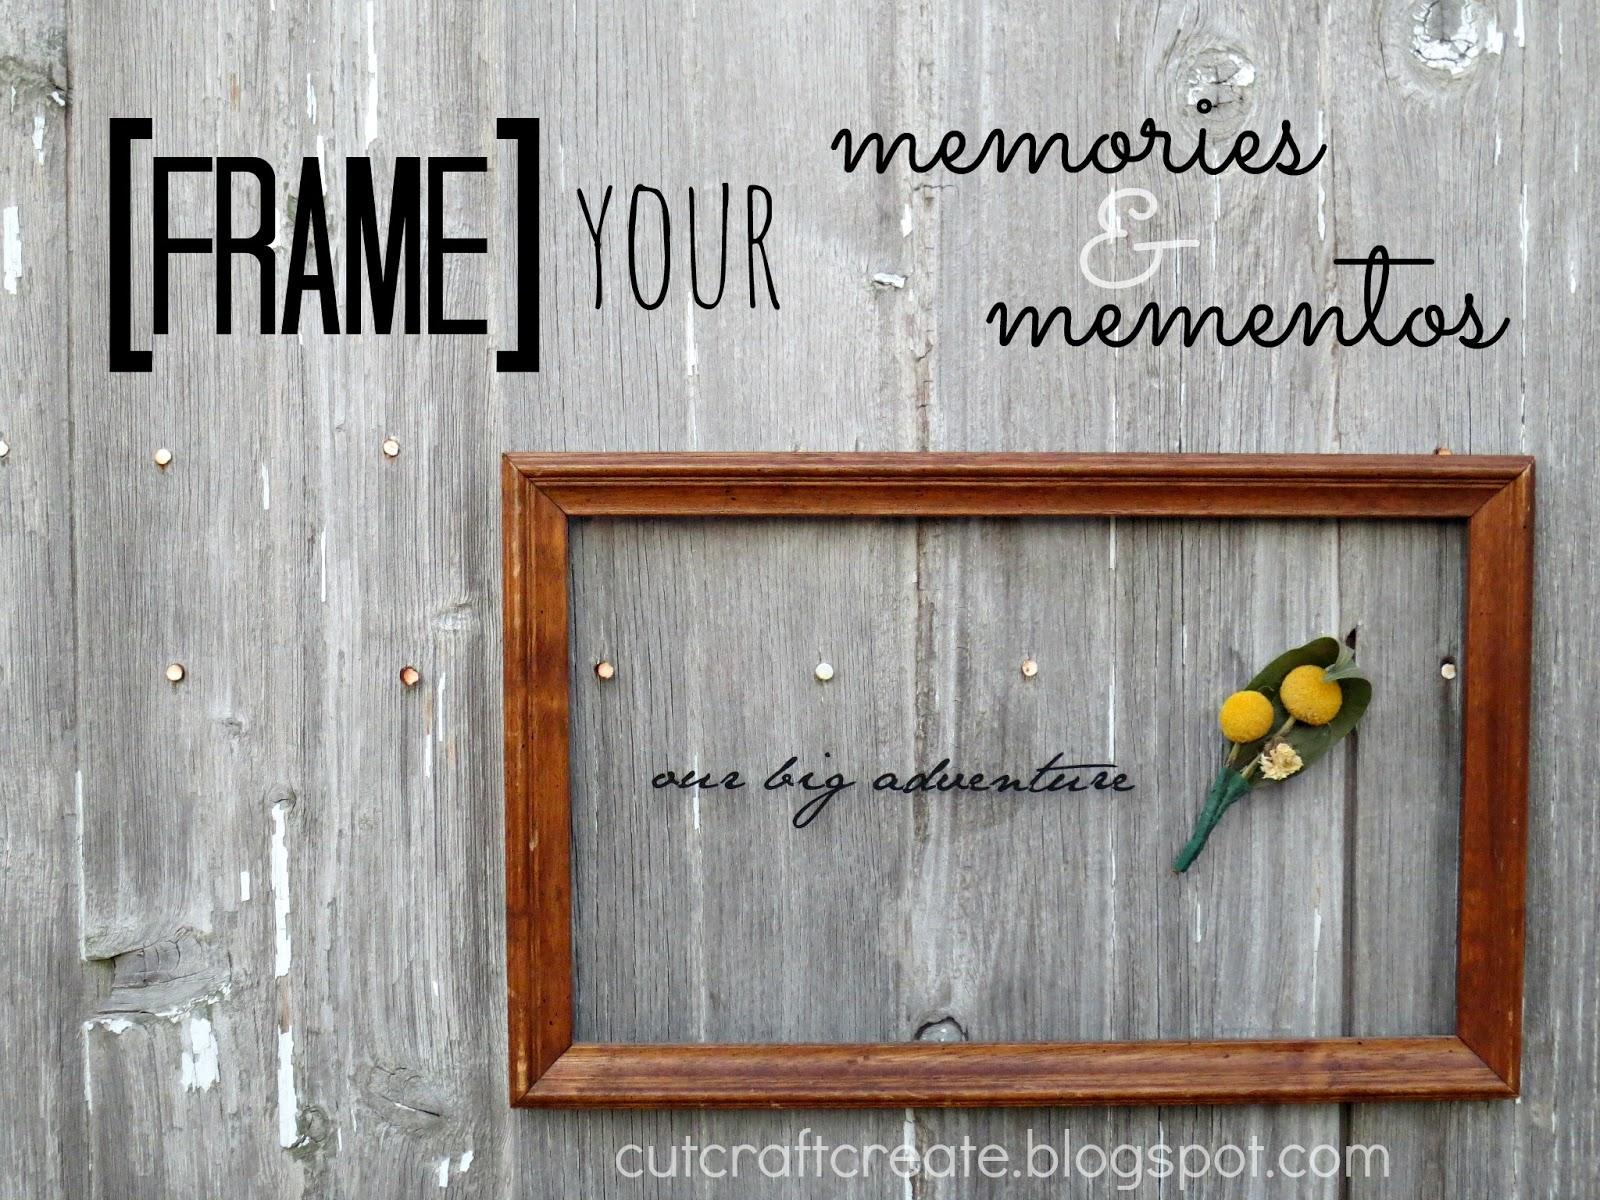 Cut, Craft, Create: Frame Your Memories & Mementos